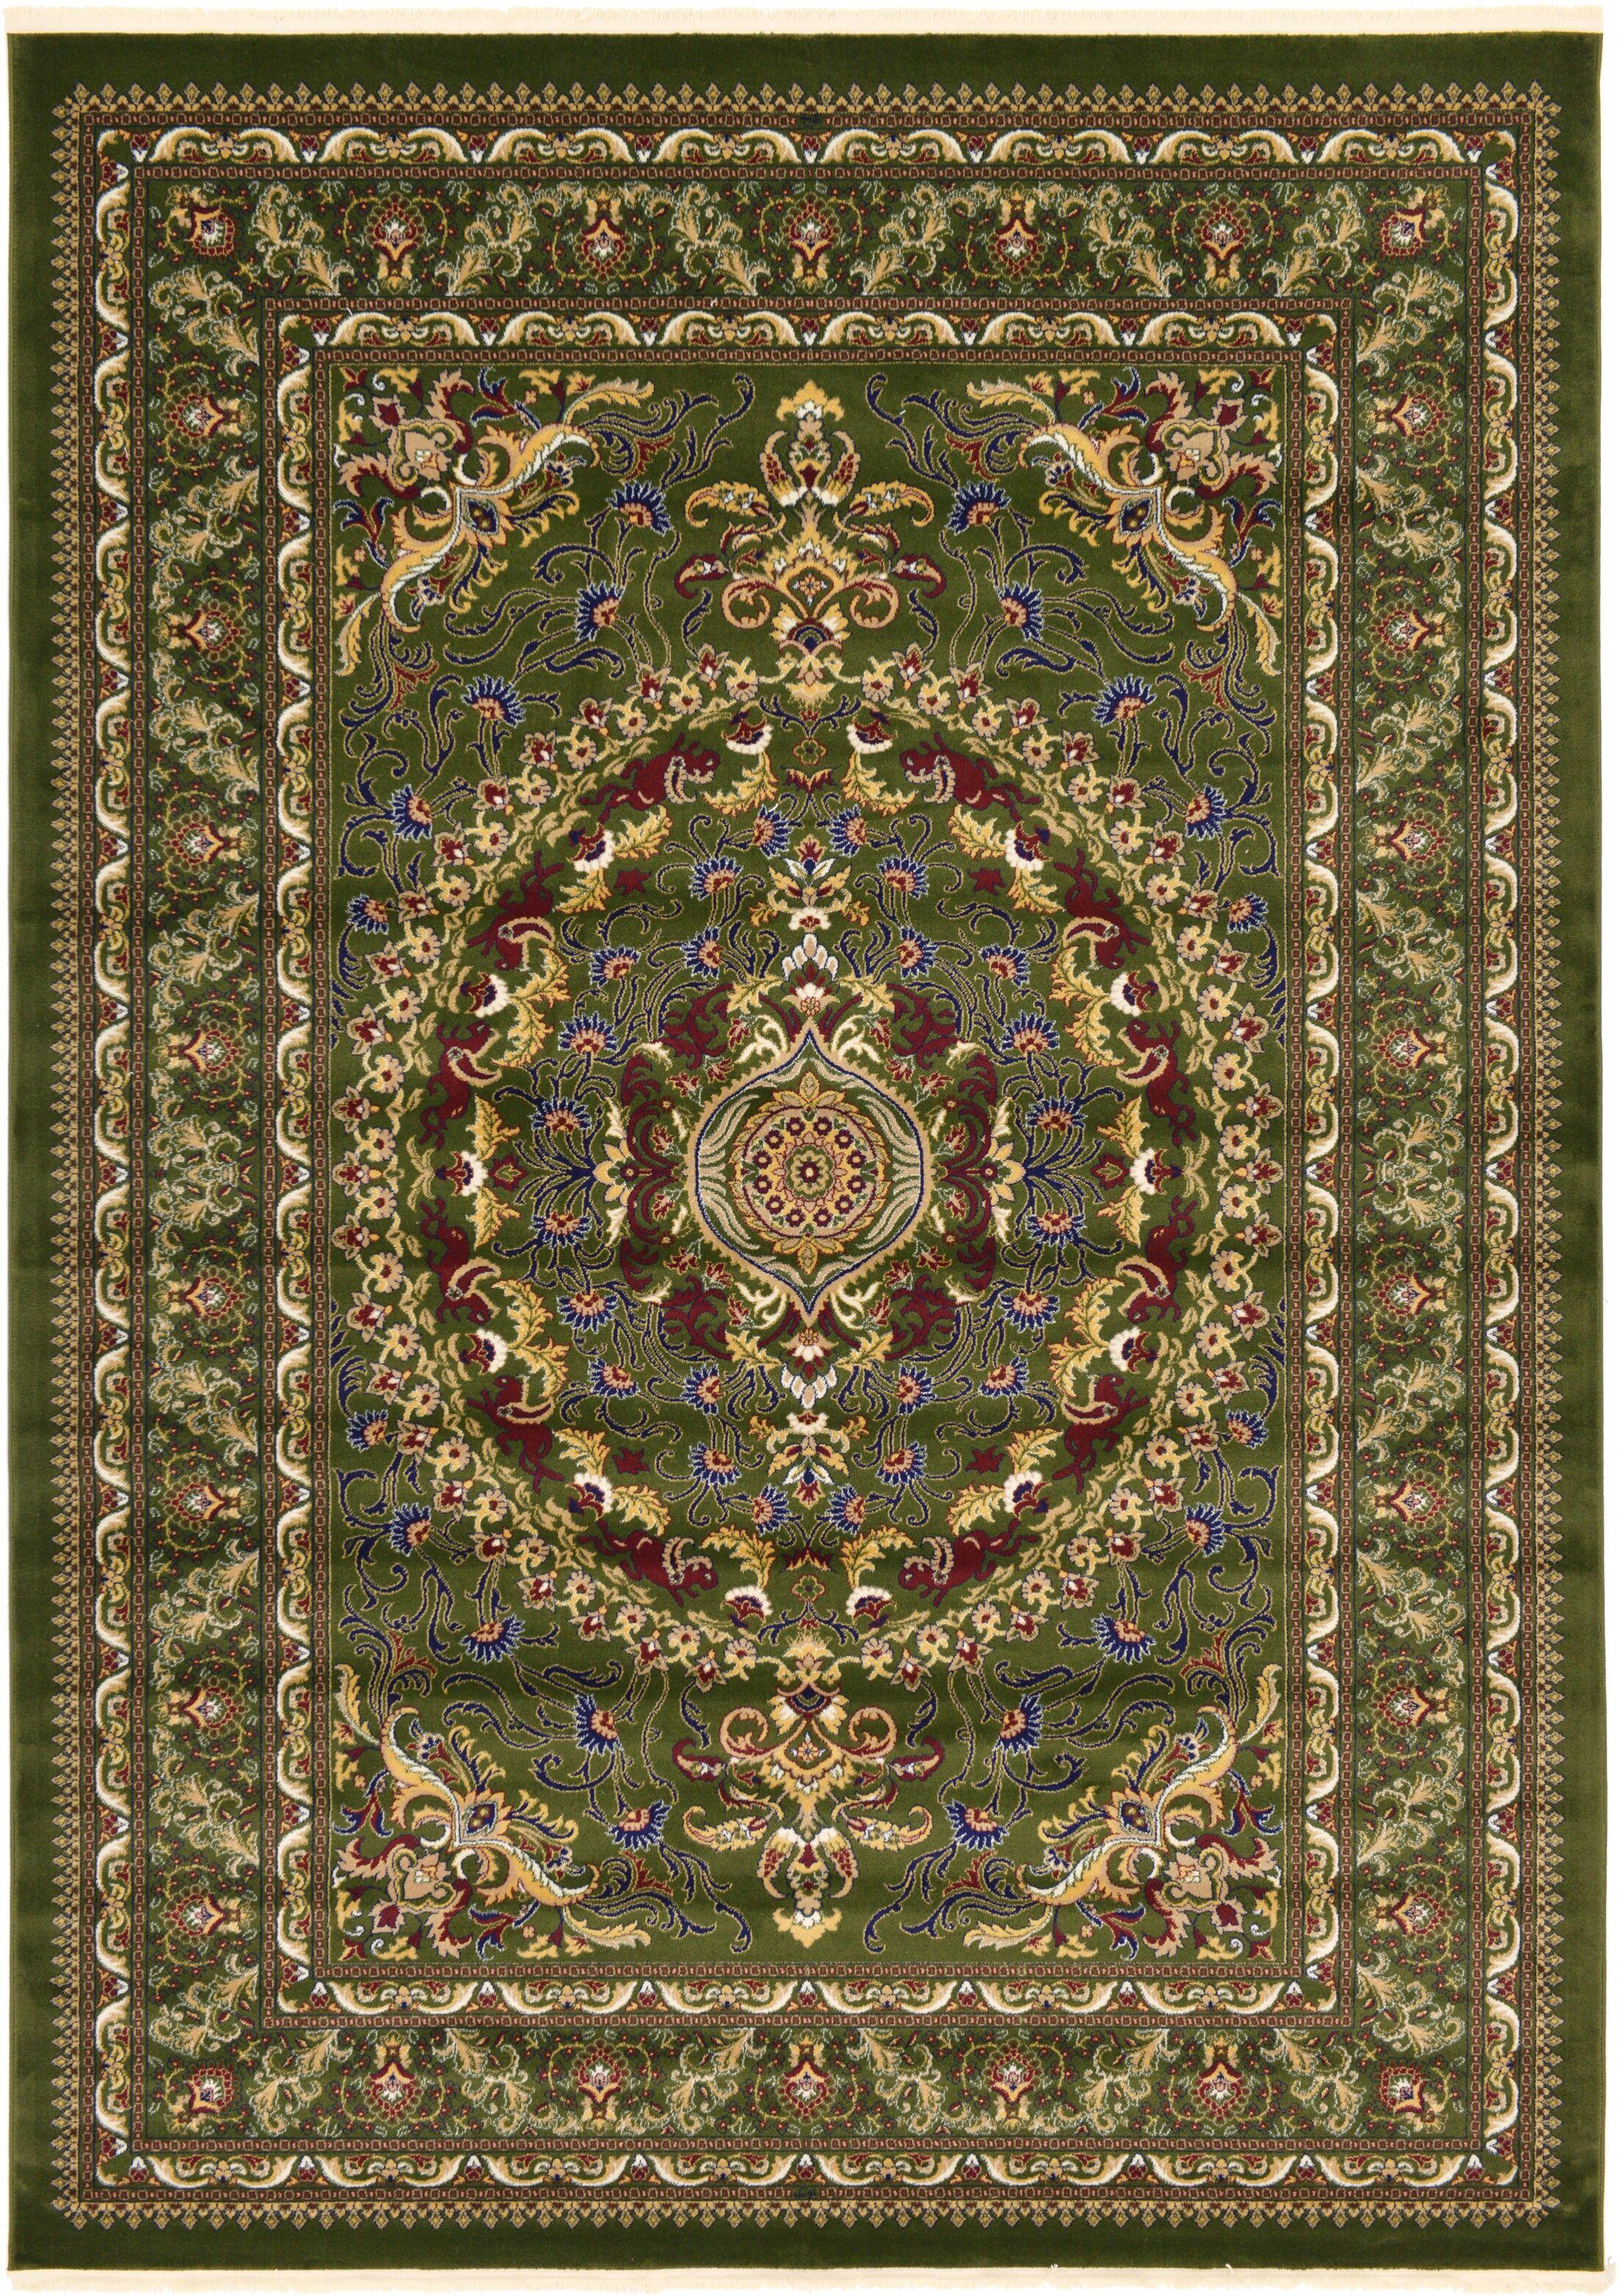 Altadena Green/Gold/Light Brown Area Rug Rug Size: Rectangle 13' x 16'5